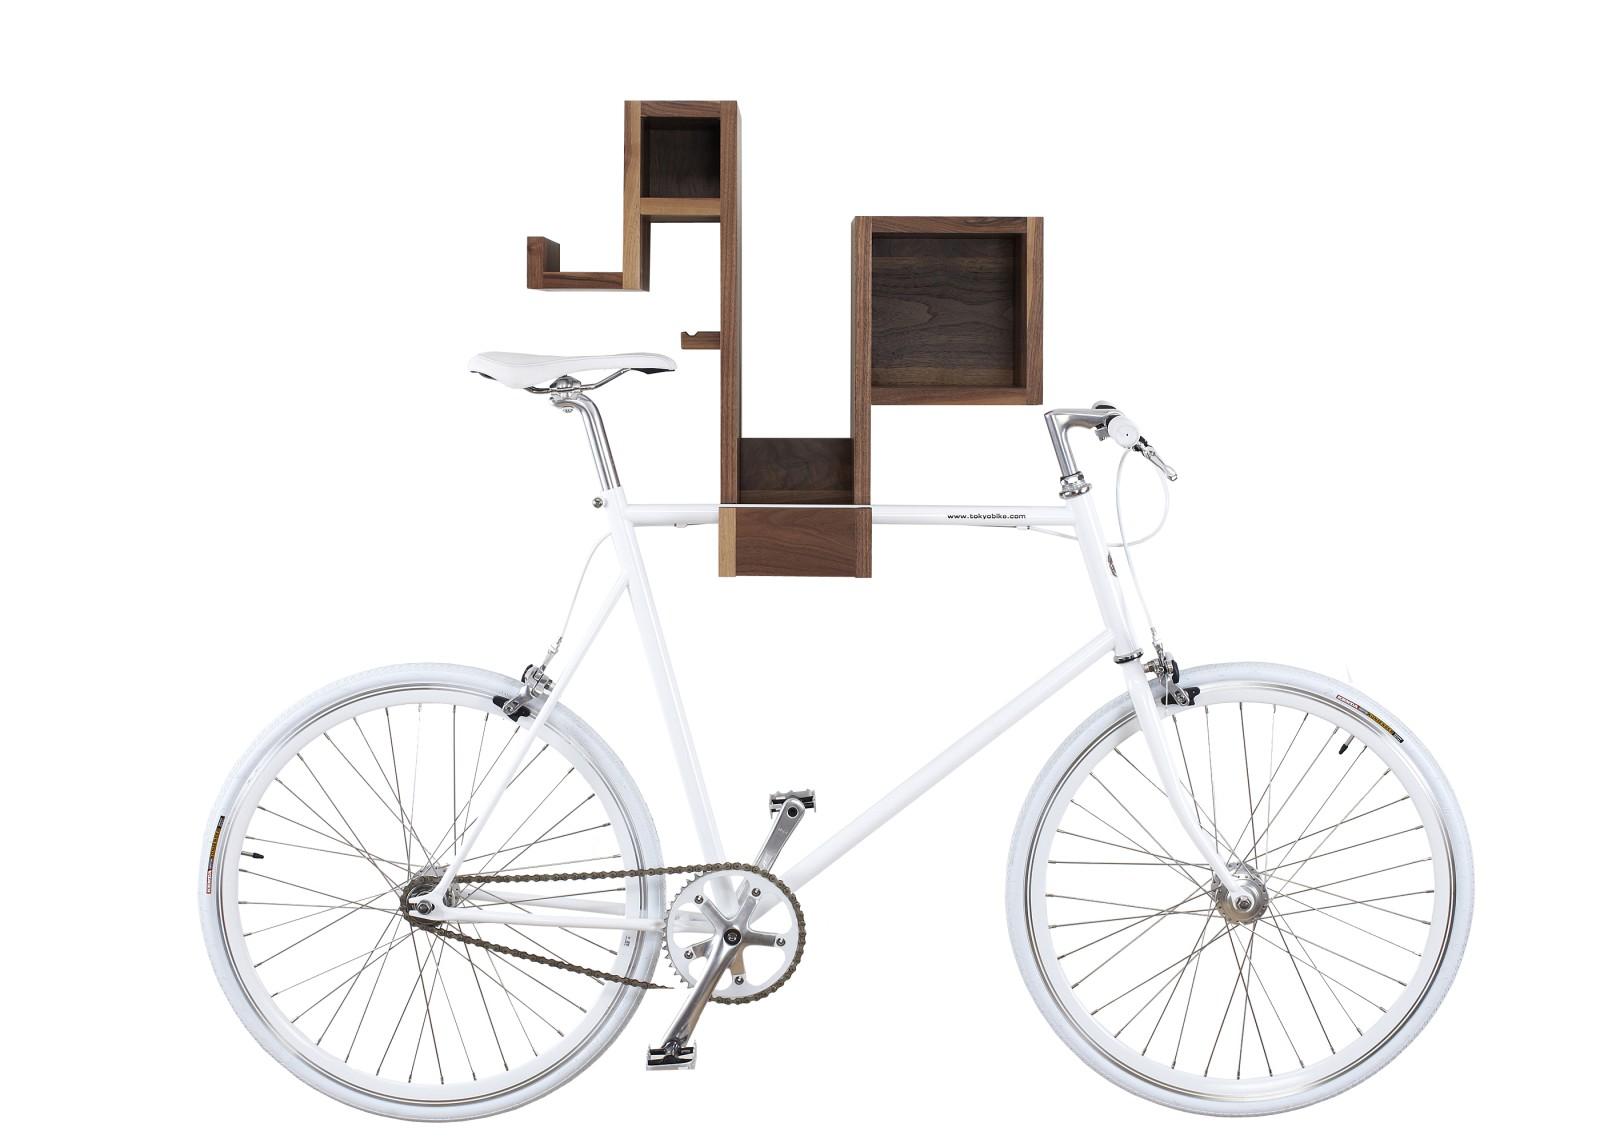 Pedal Pod Bike Rack Walnut